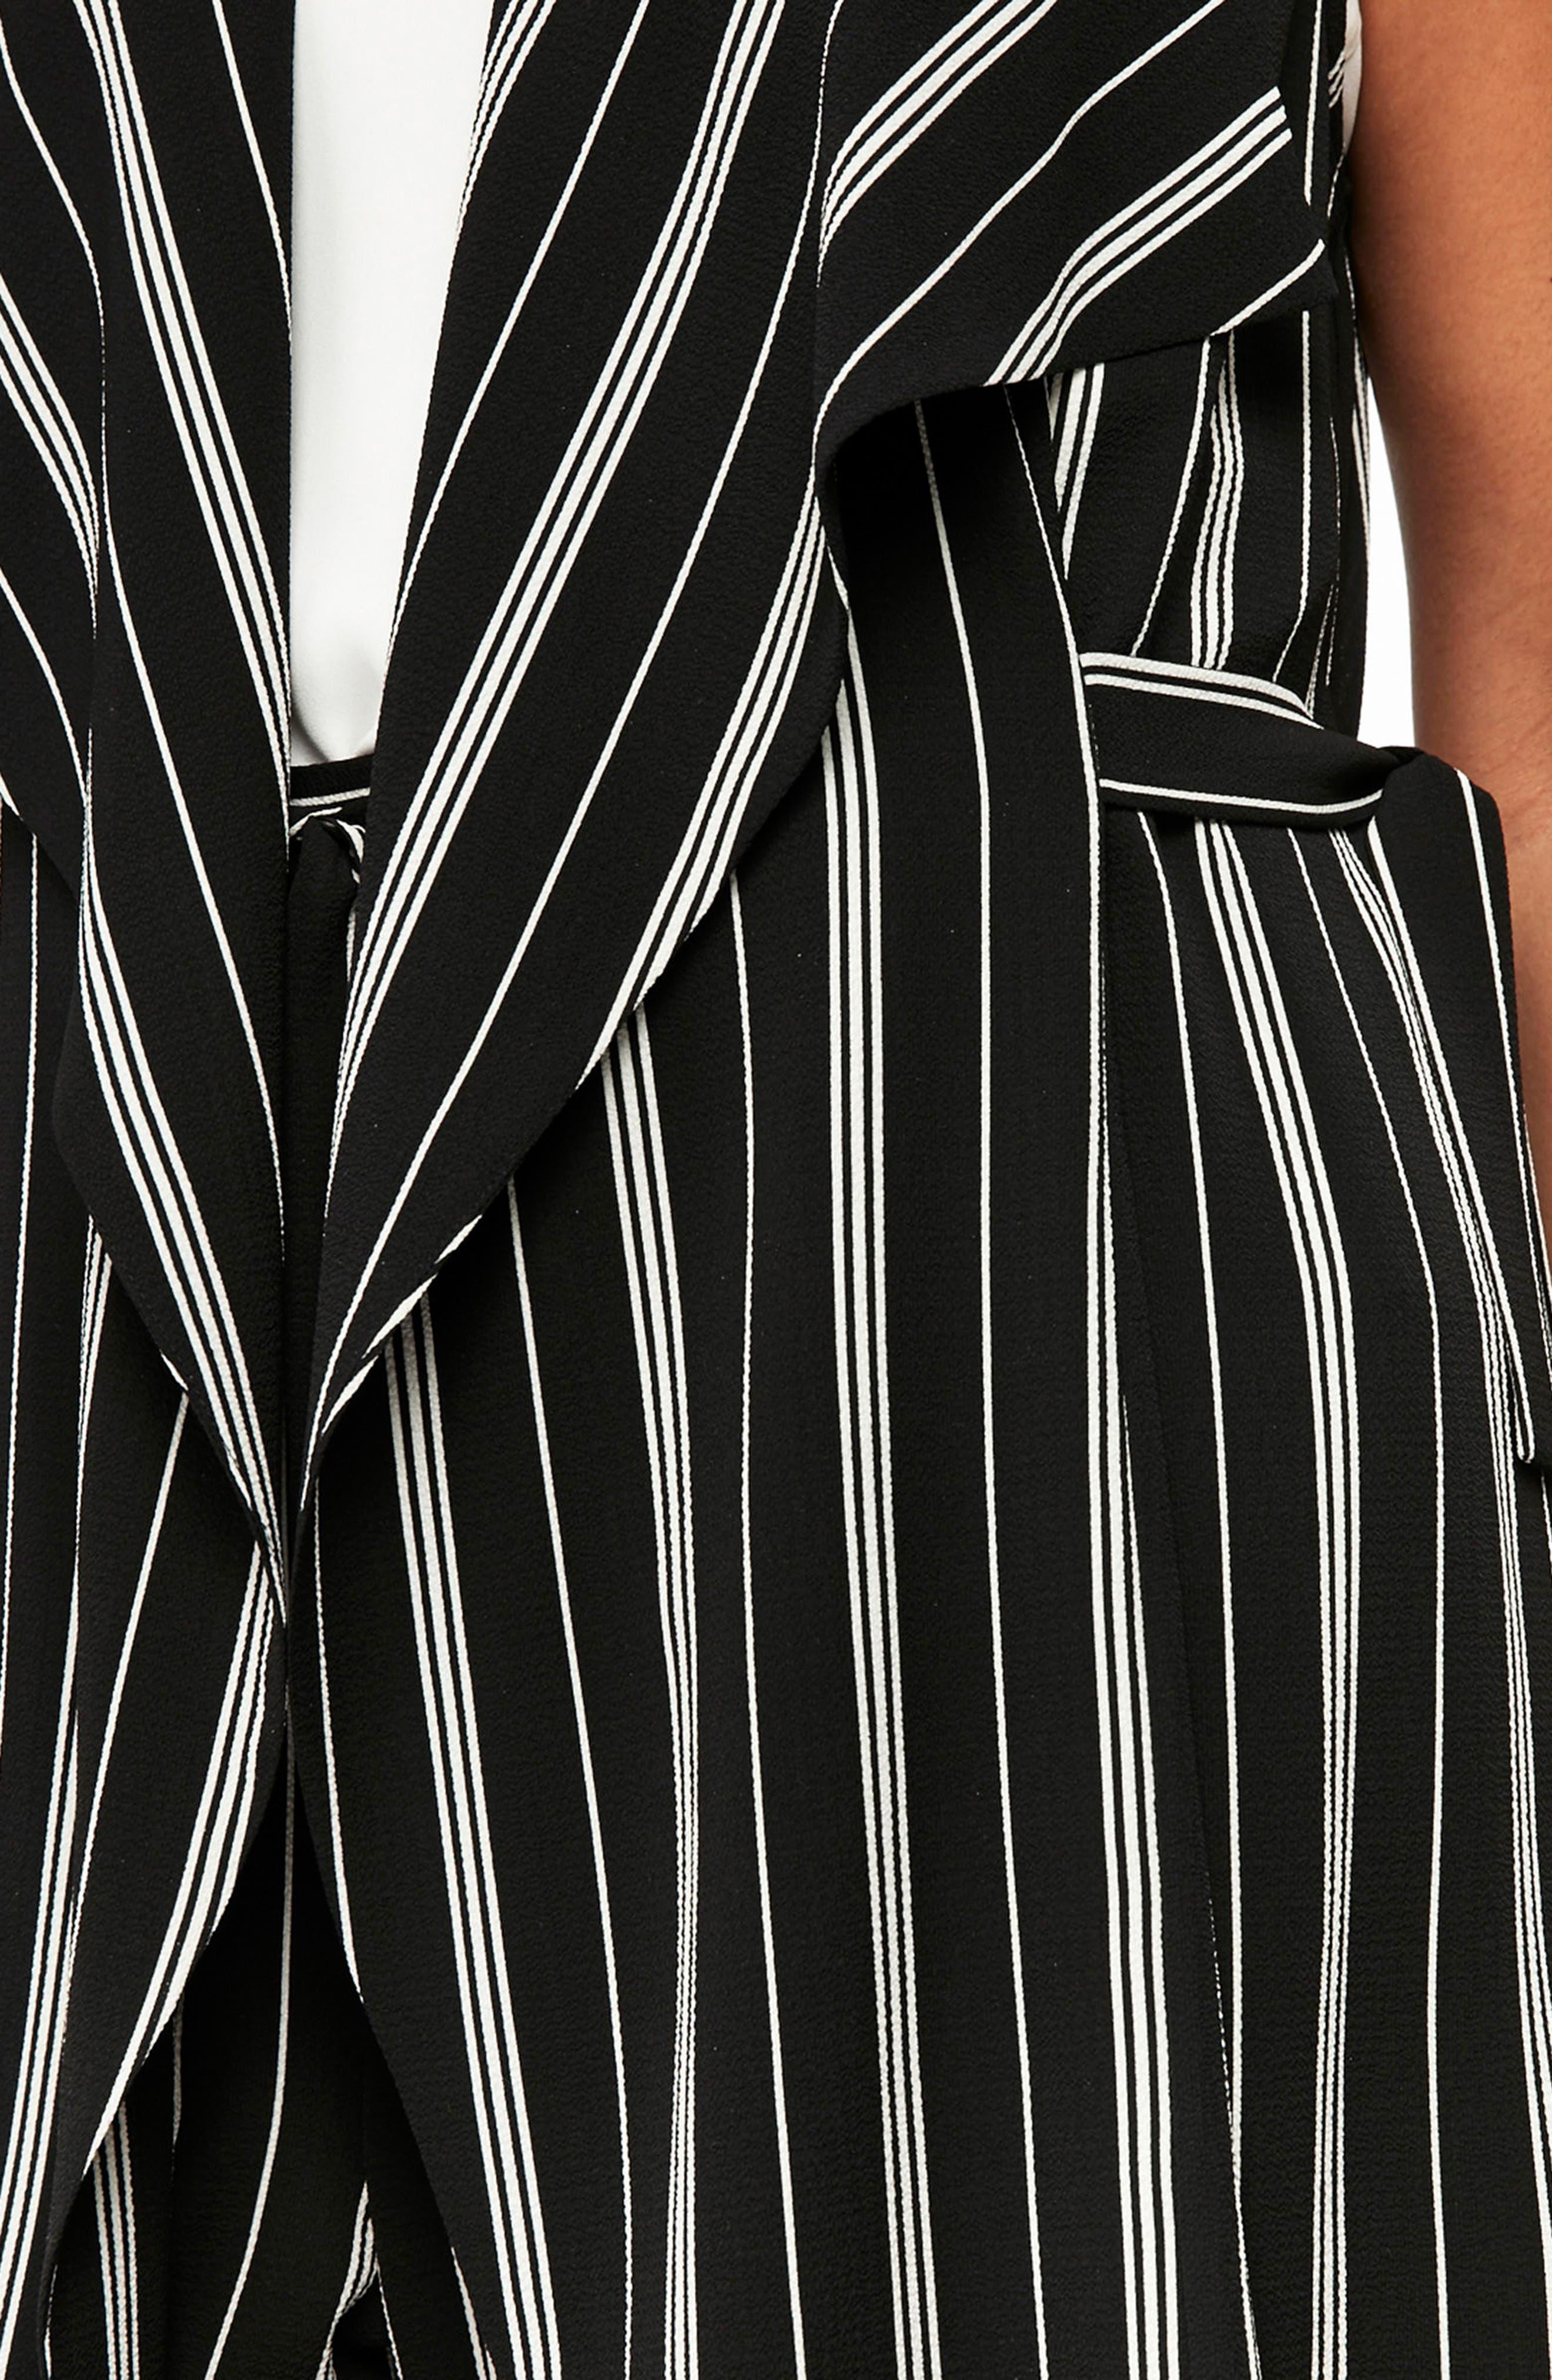 Stripe Sleeveless Jacket,                             Alternate thumbnail 3, color,                             Black/ White